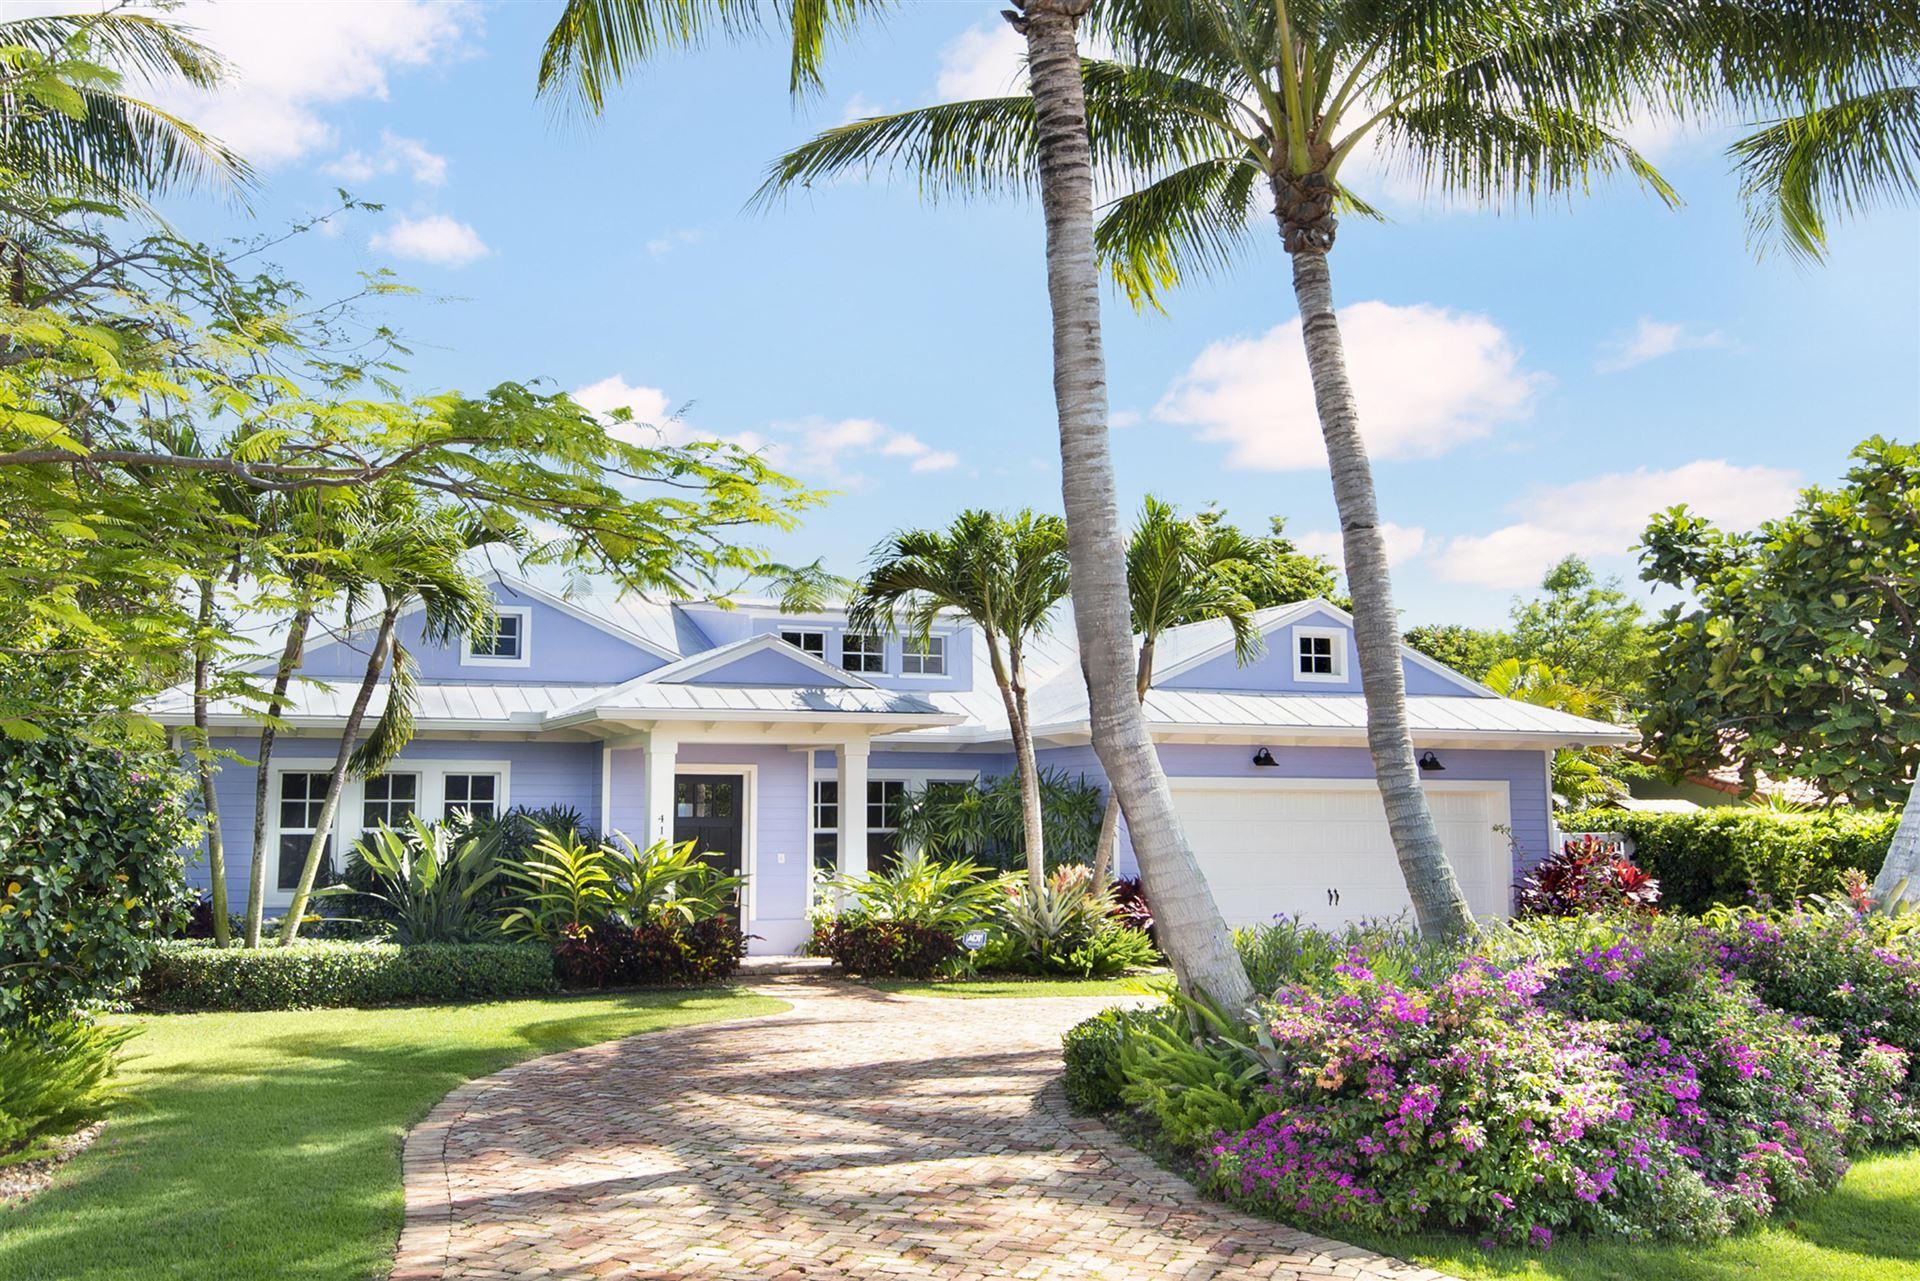 418 NW 14th Street, Delray Beach, FL 33444 - MLS#: RX-10716099